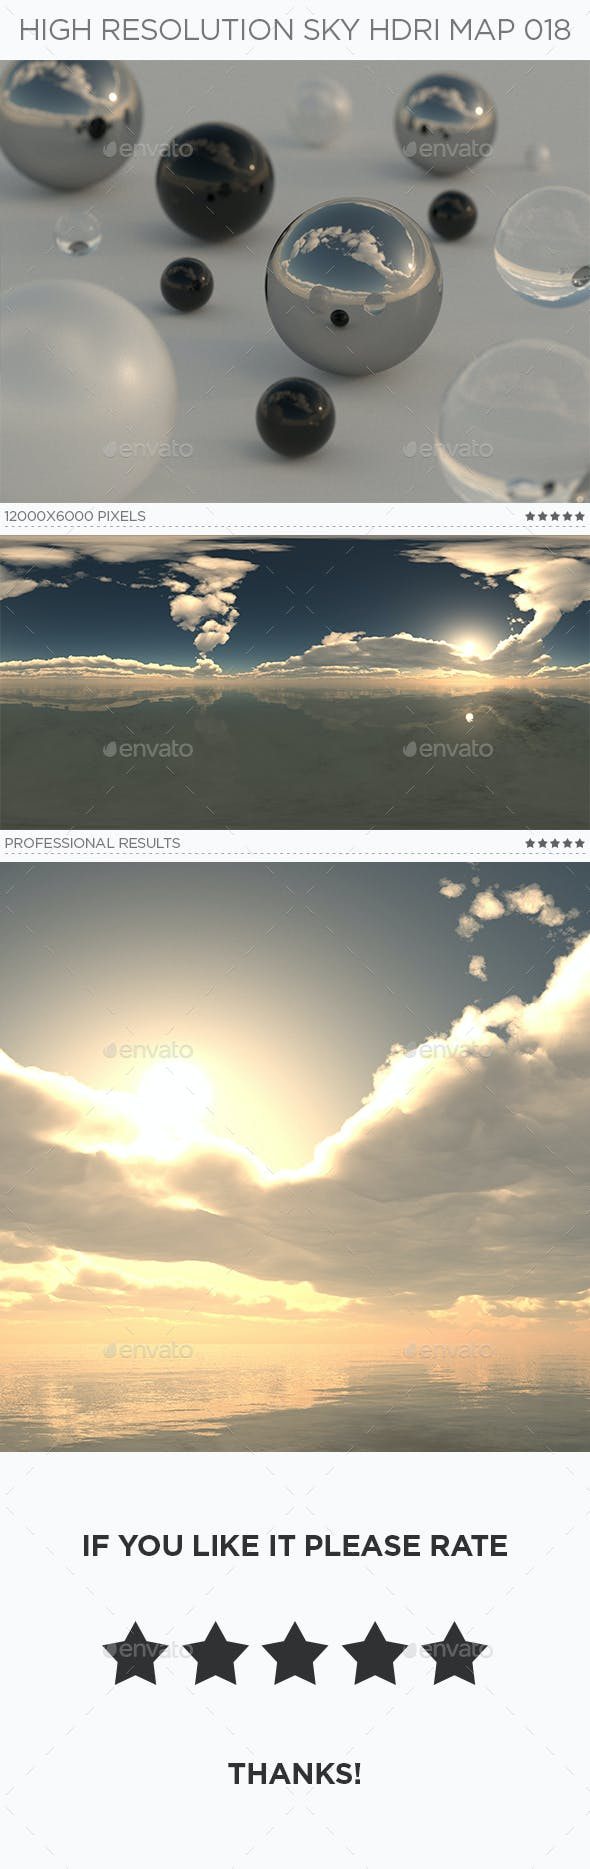 High Resolution Sky HDRi Map 018 - 3DOcean Item for Sale